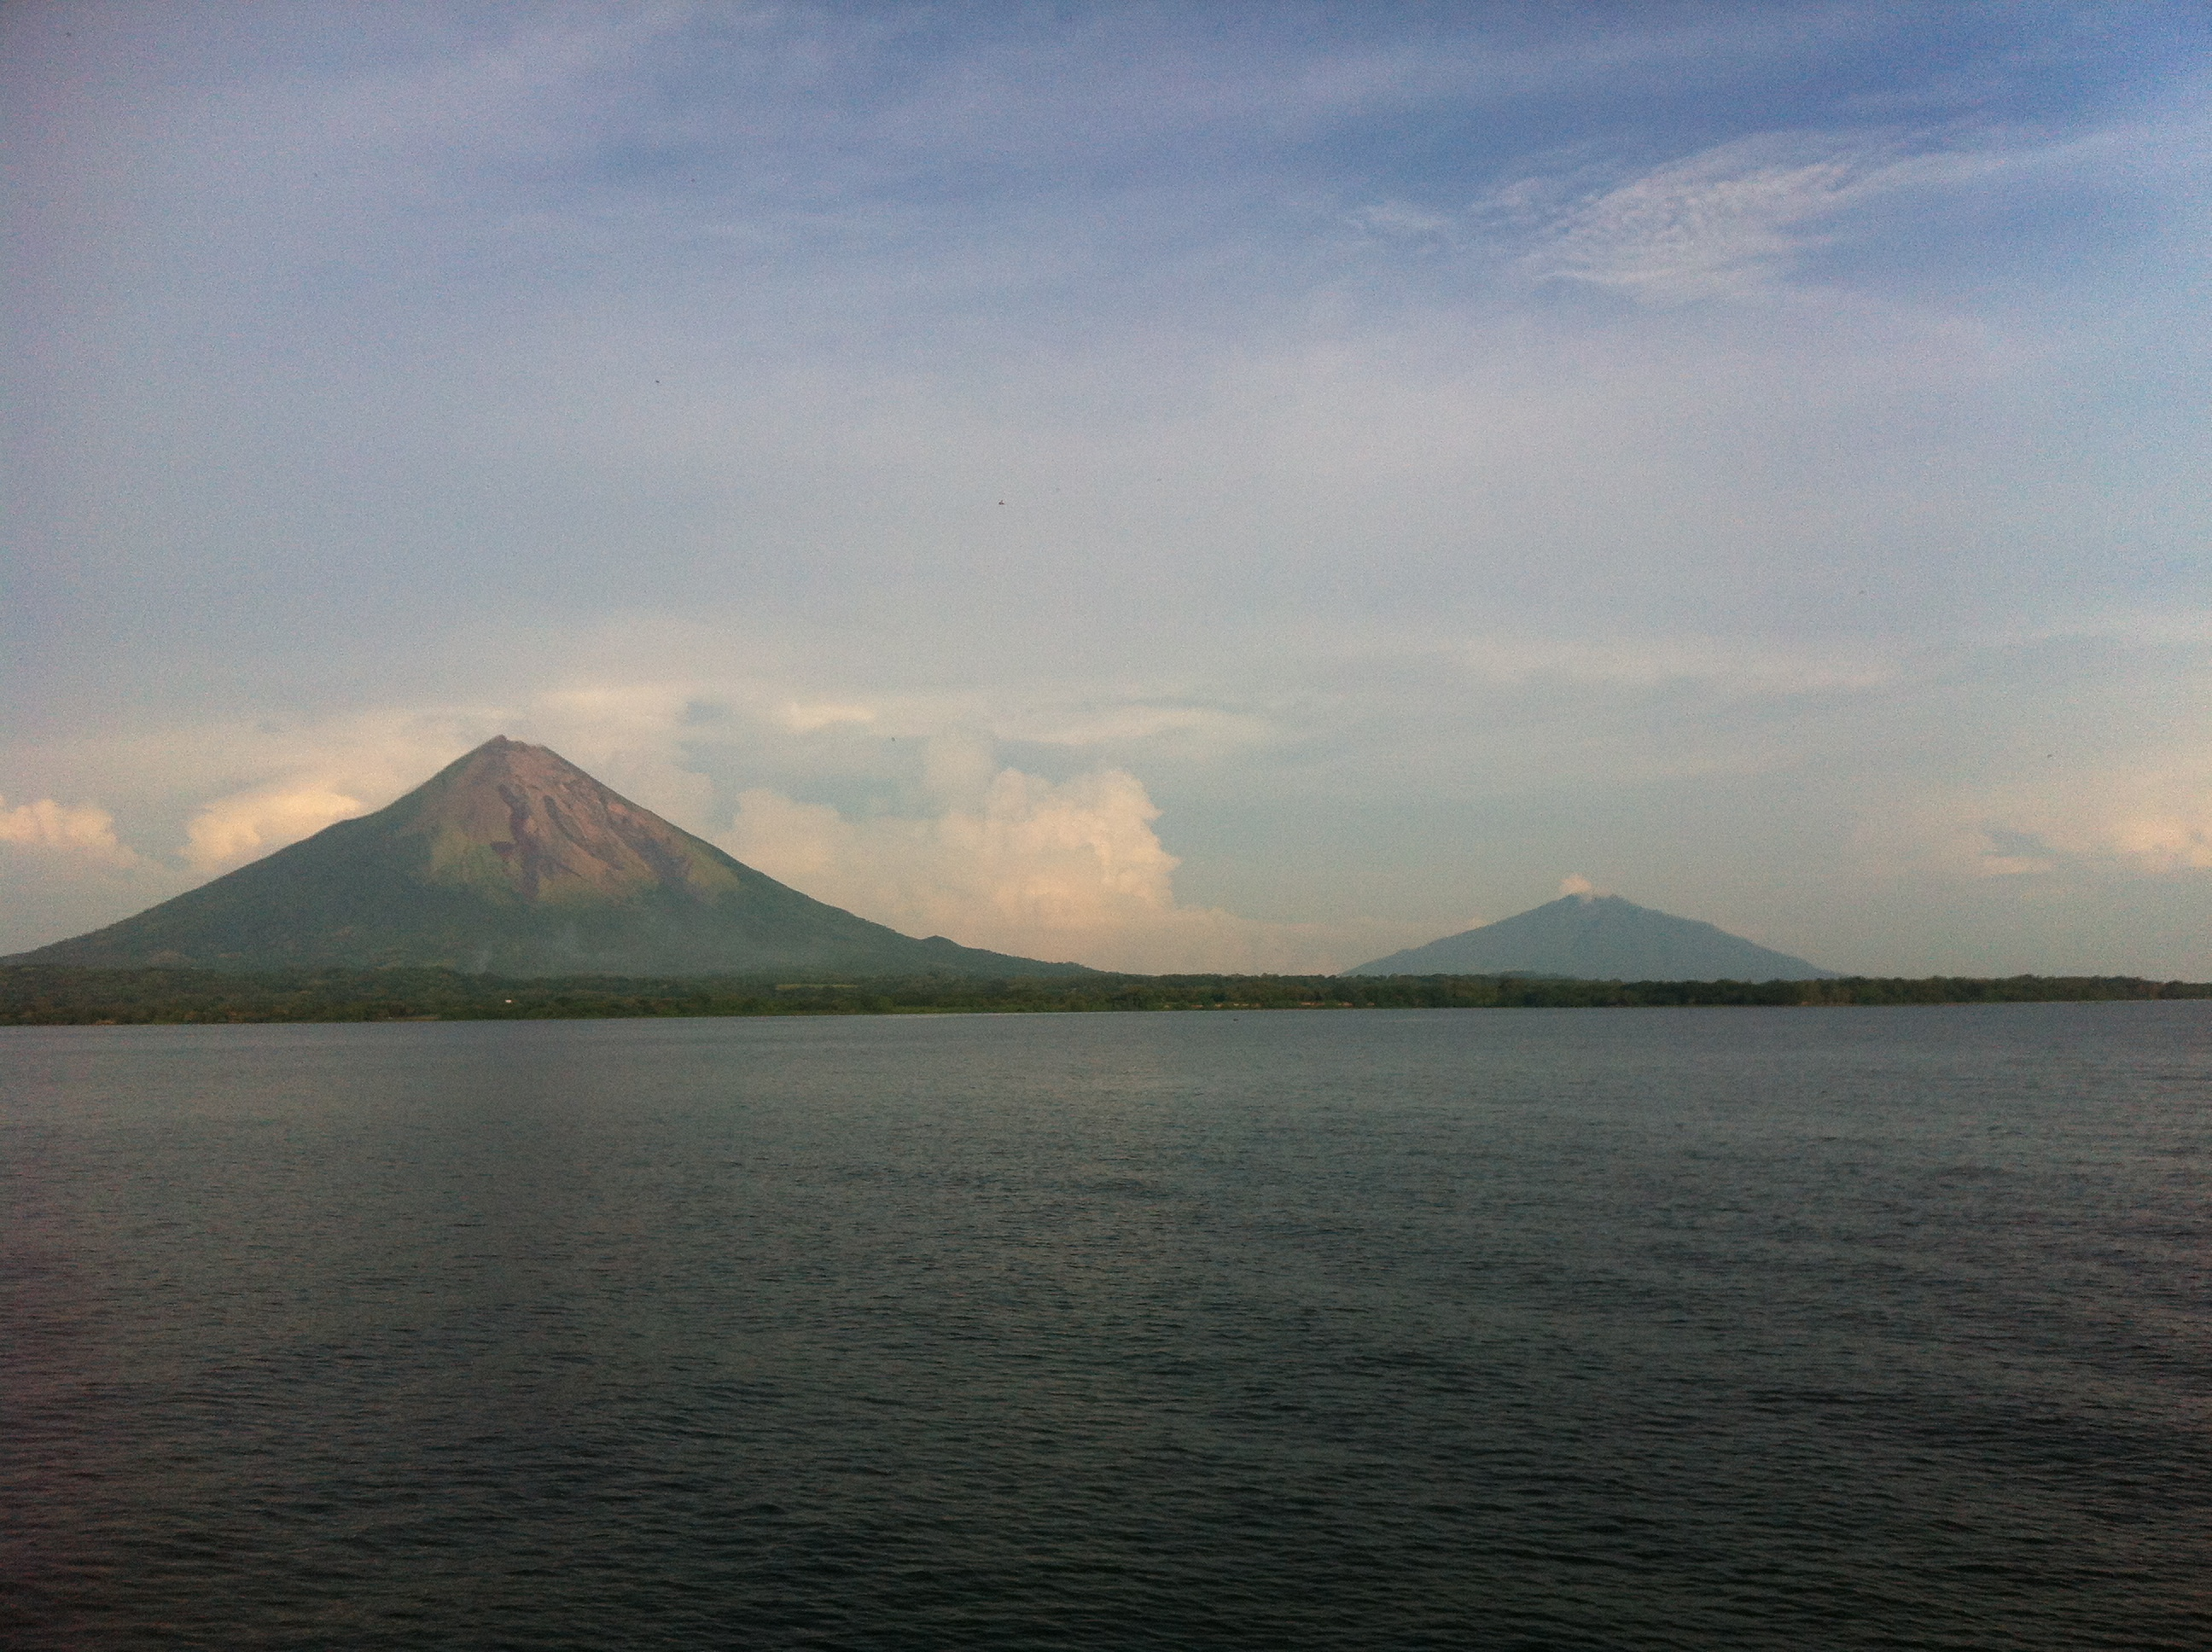 La Isla de Ometepe | Photo by Wilson Carletti (All Rights Reserved)